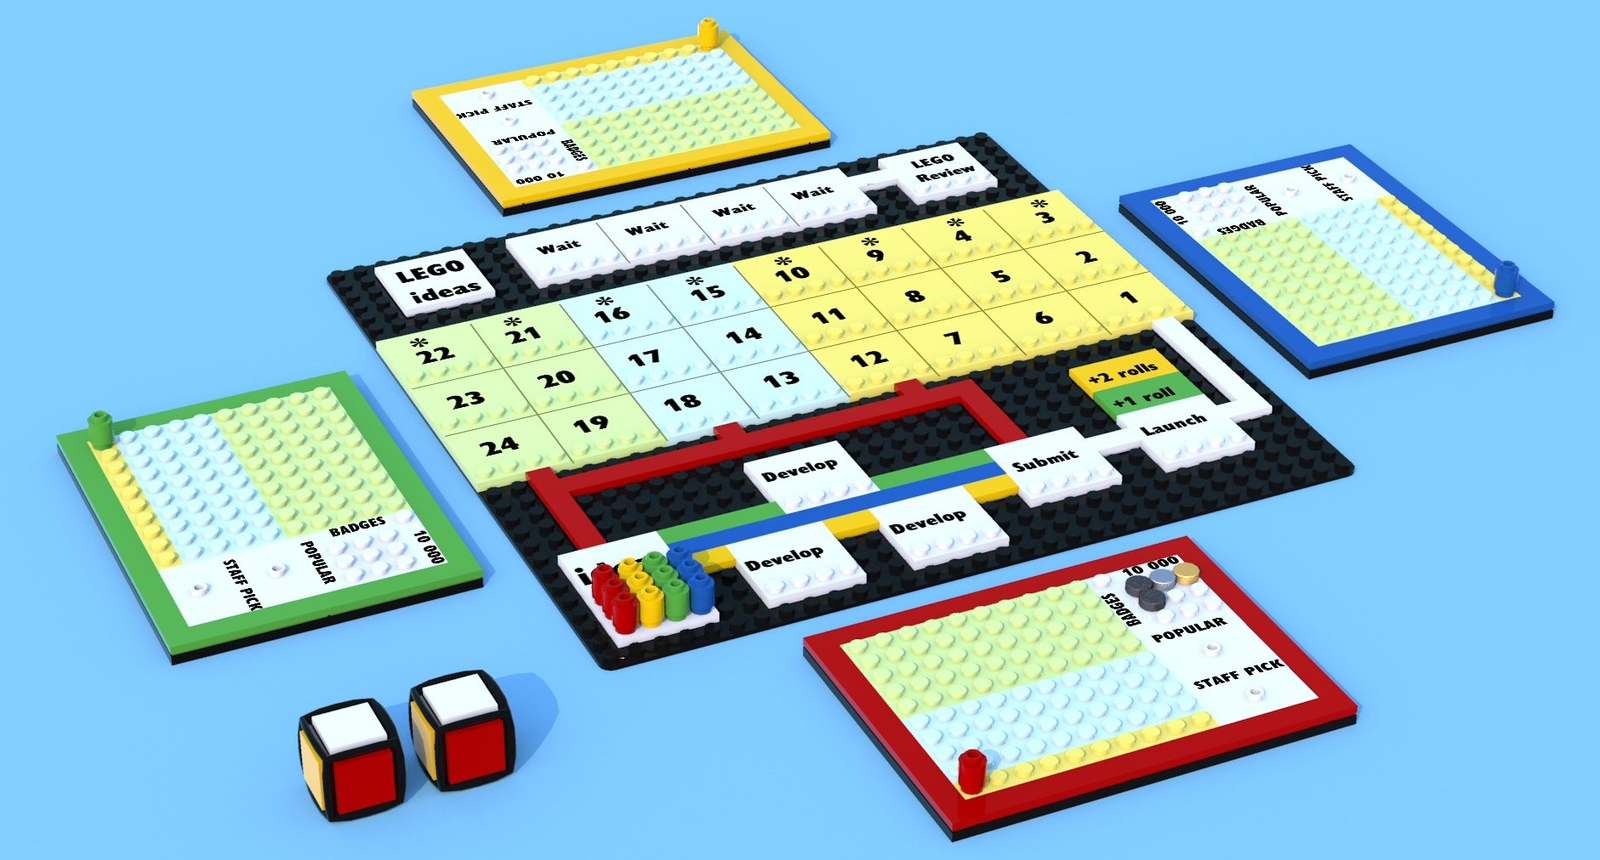 lego ideas product ideas lego ideas game